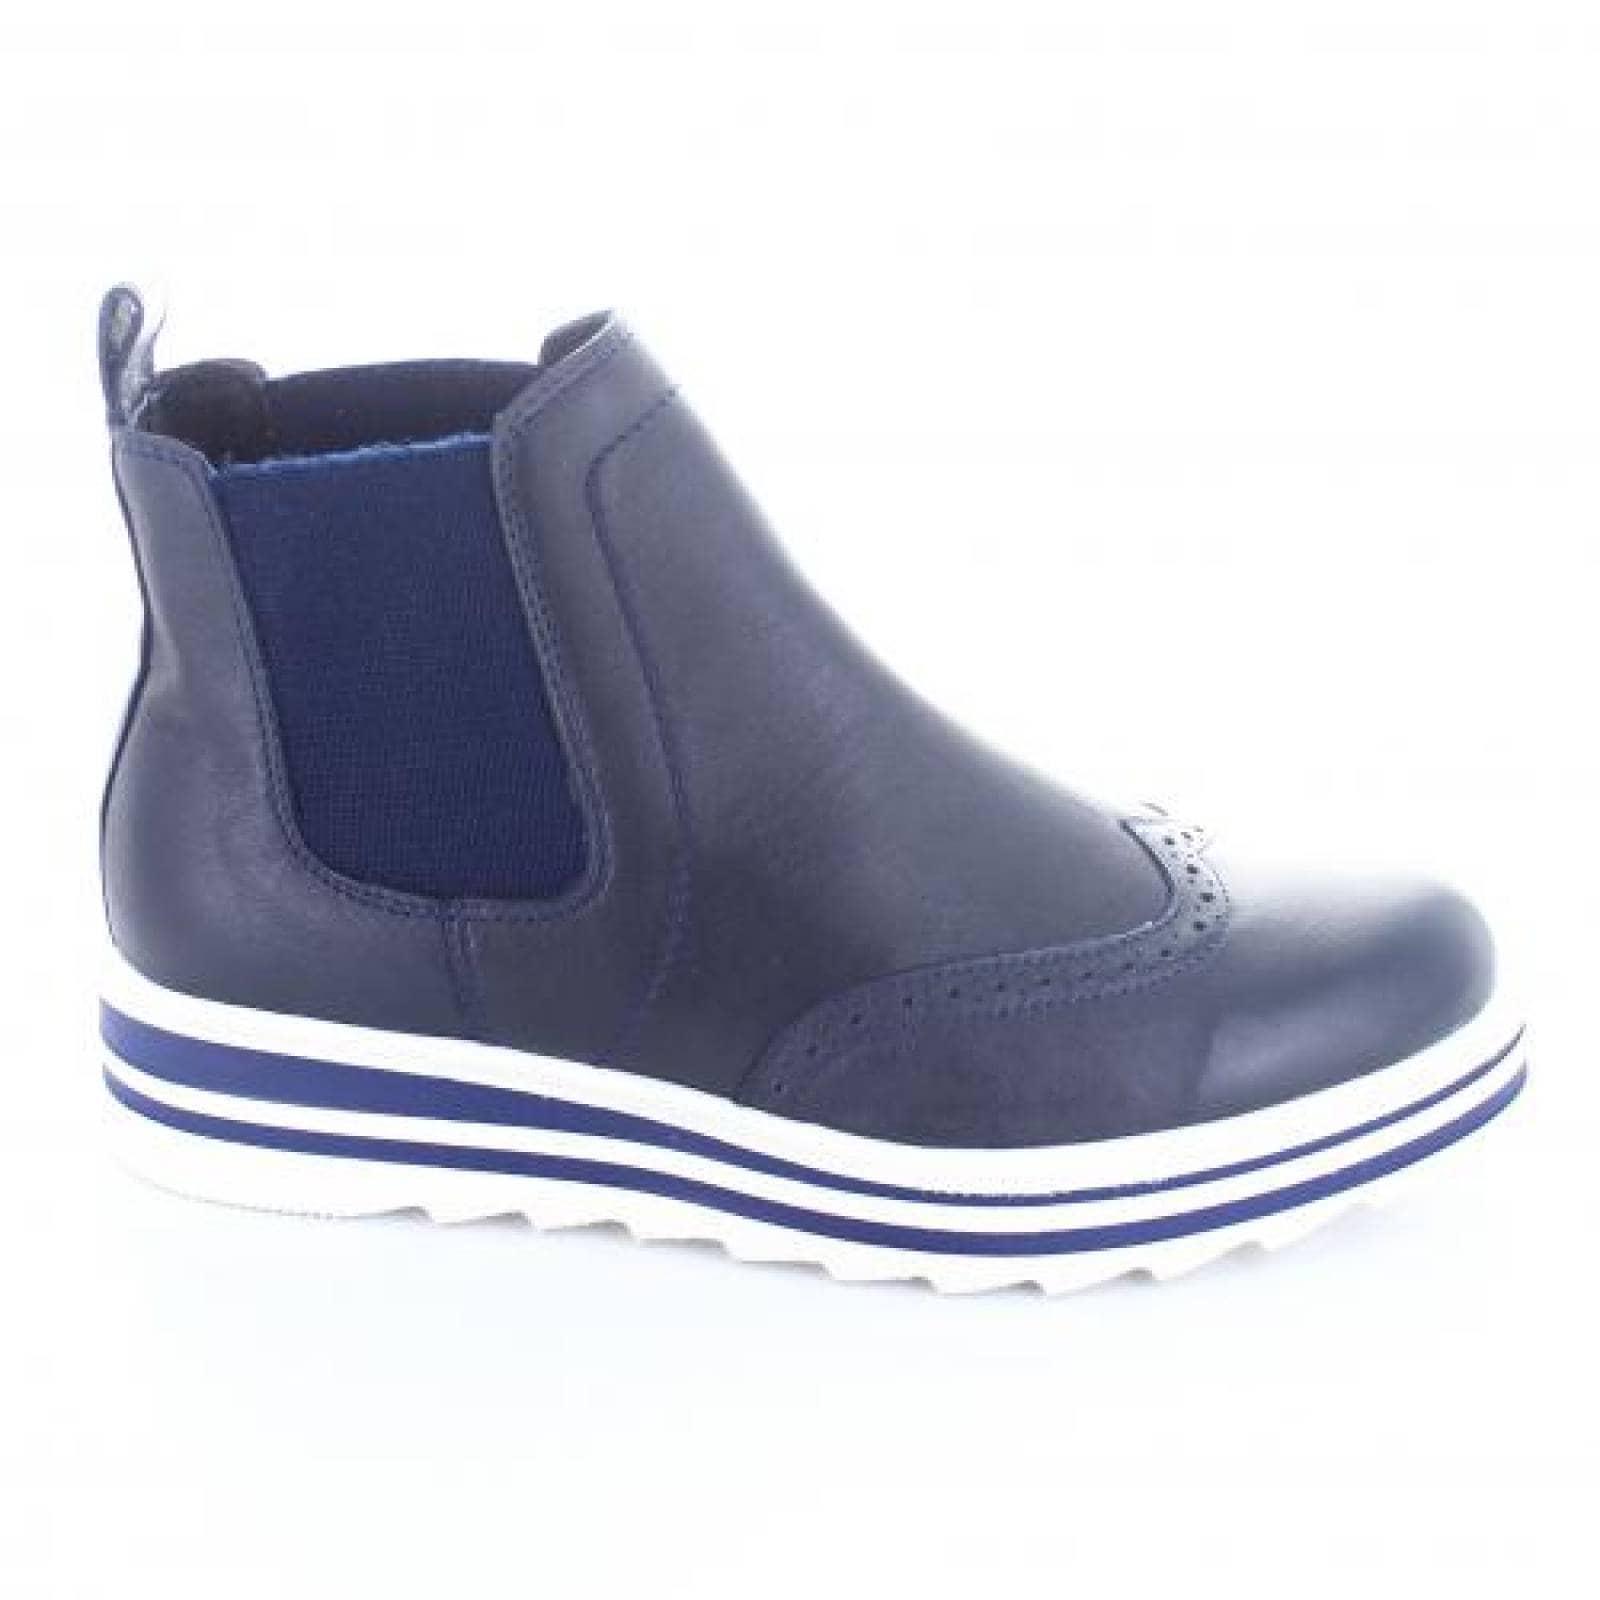 Botin para Mujer Brantano 7606 049780 Color Azul